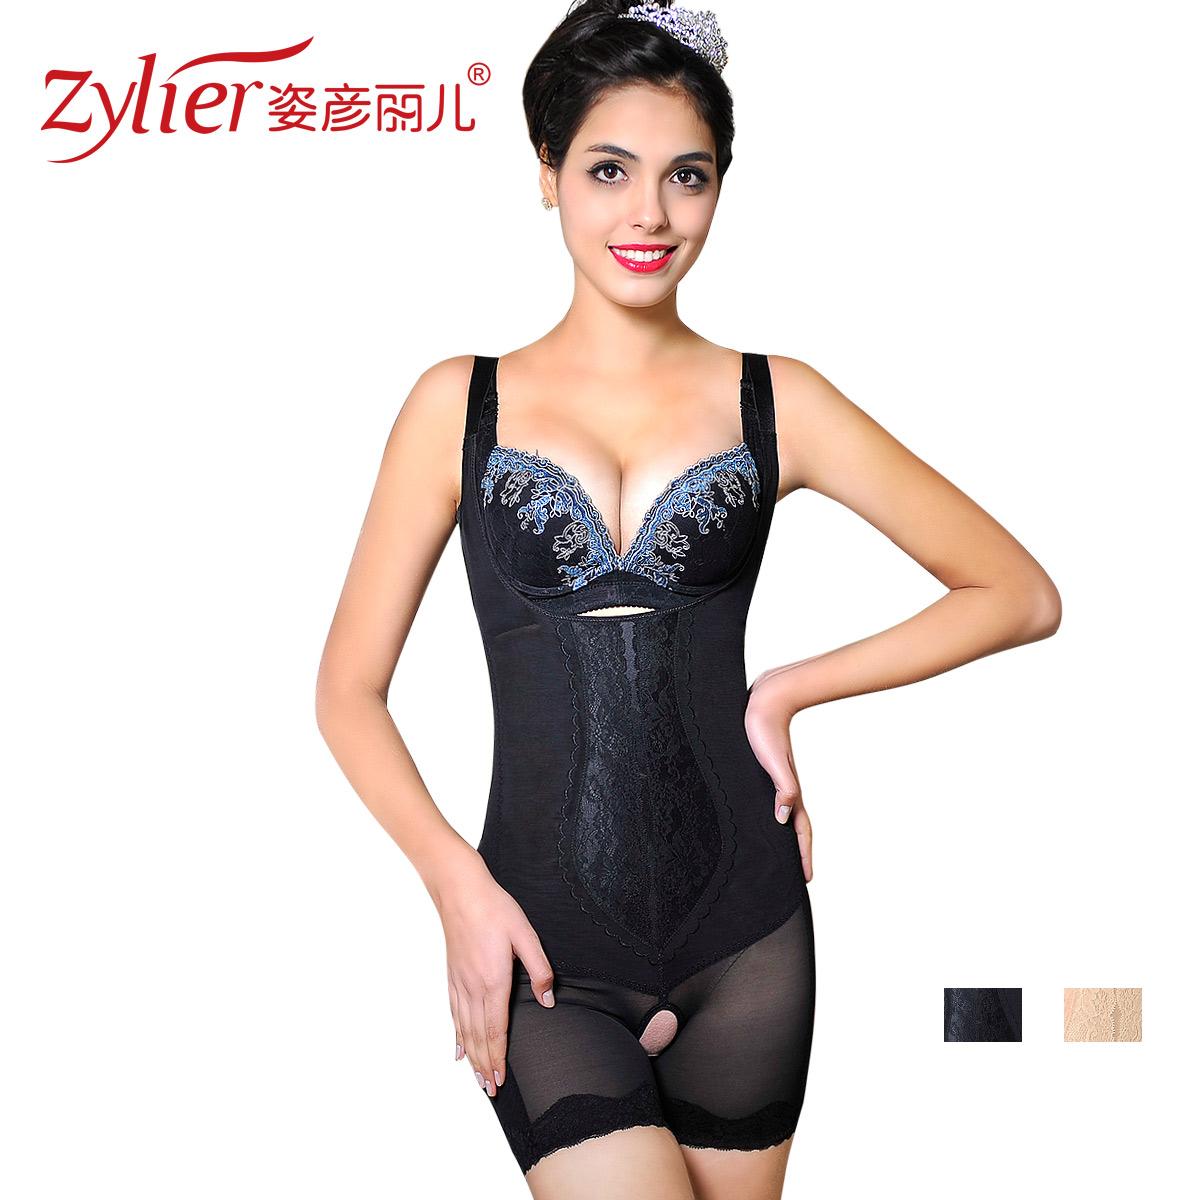 b7e0eab5f9 freeshipping Magic 3cm summer ultra-thin one piece shaper beauty care  underwear shapewear abdomen drawing lt116